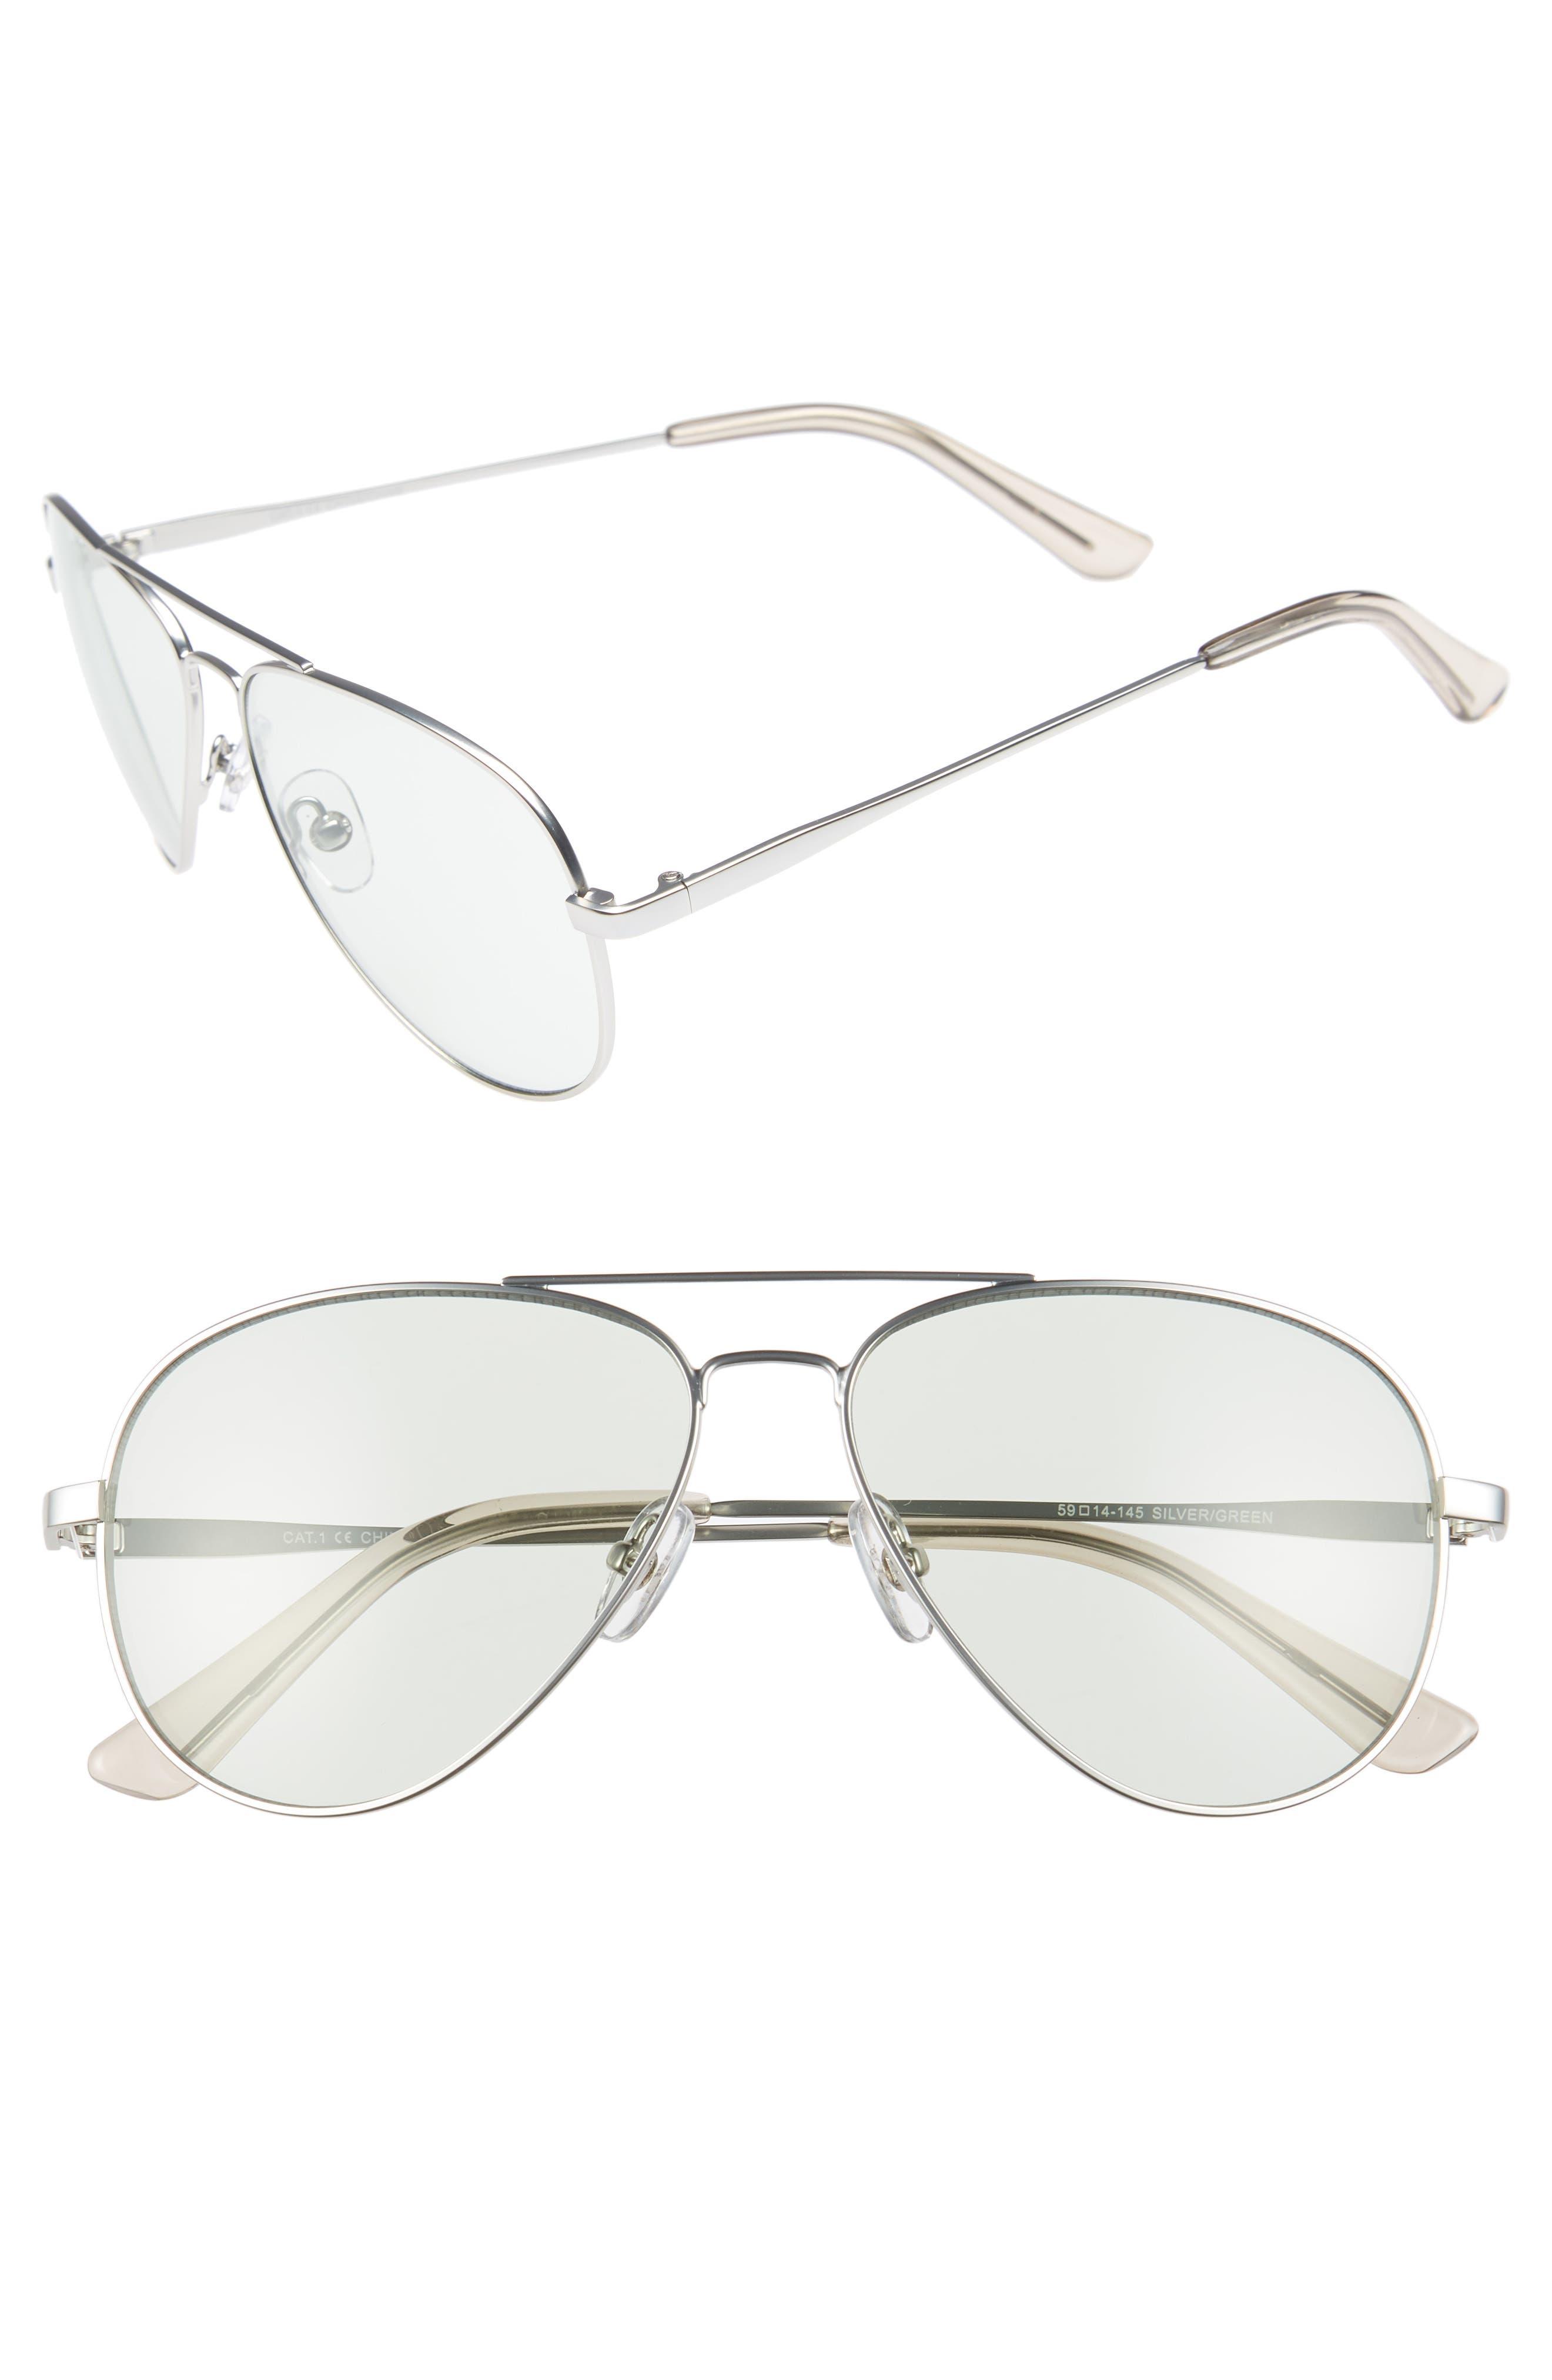 Davis 59mm Aviator Sunglasses,                             Main thumbnail 1, color,                             SILVER/ GREEN